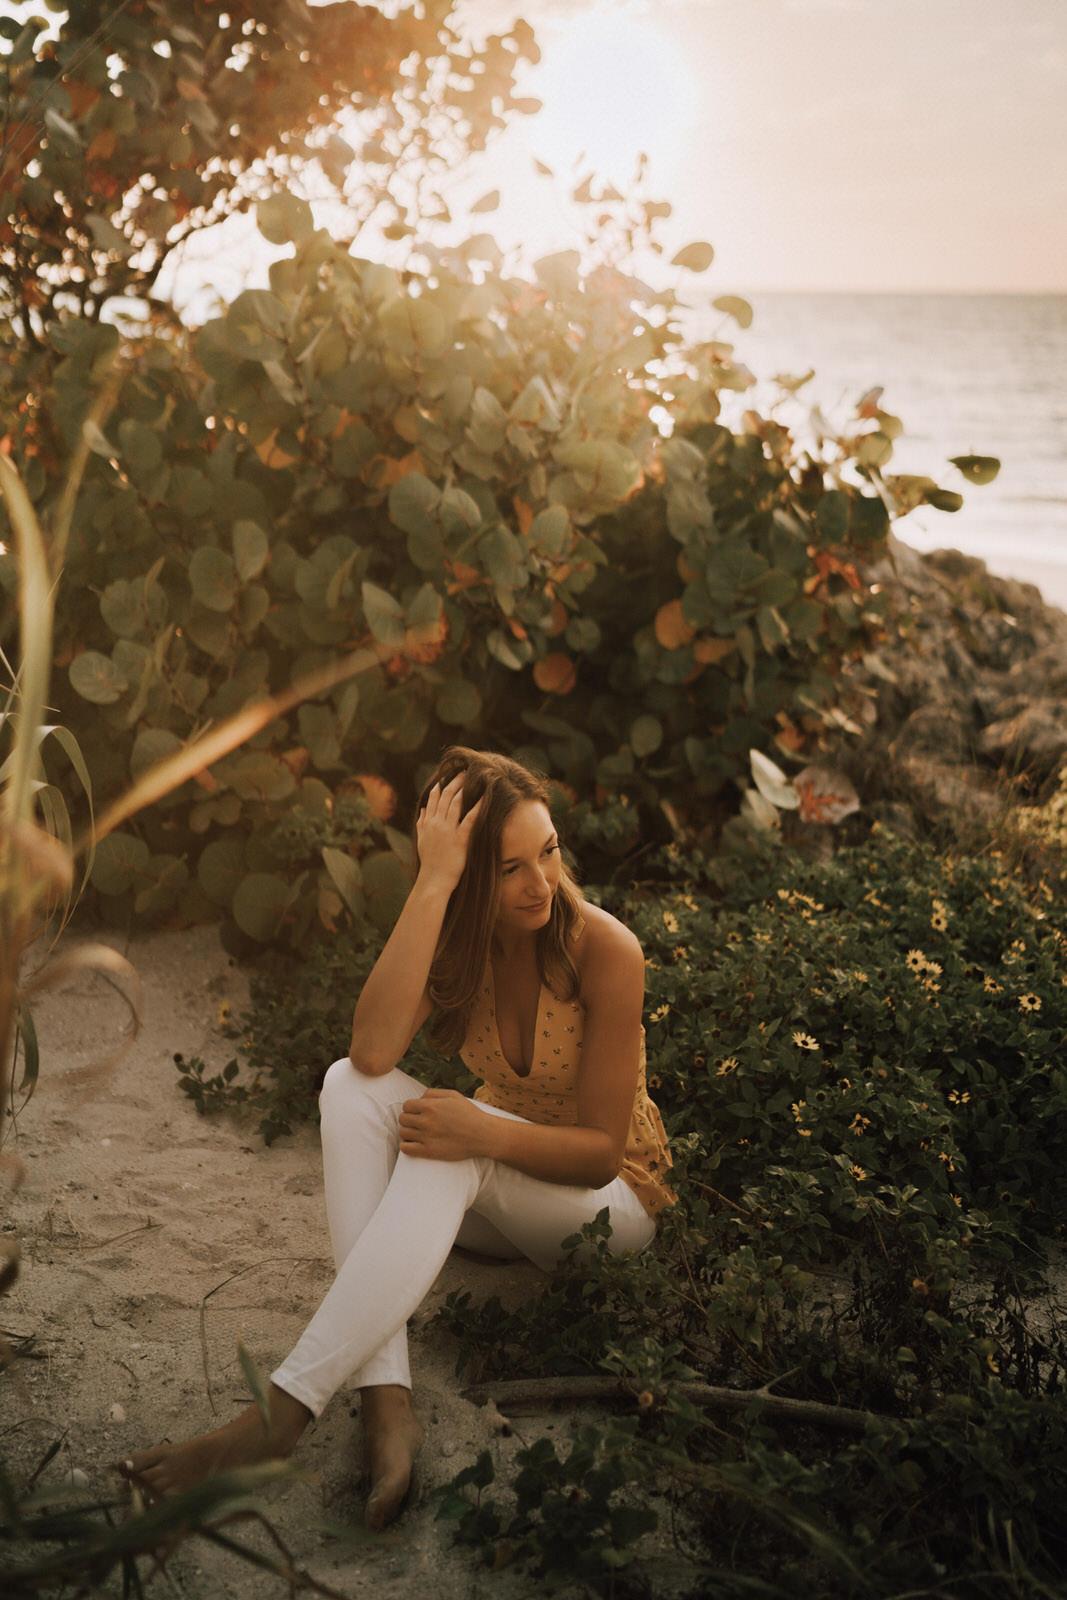 Fort Myers Senior Photos on Bonita Beach - Michelle Gonzalez Photography - Sammie-86.JPG